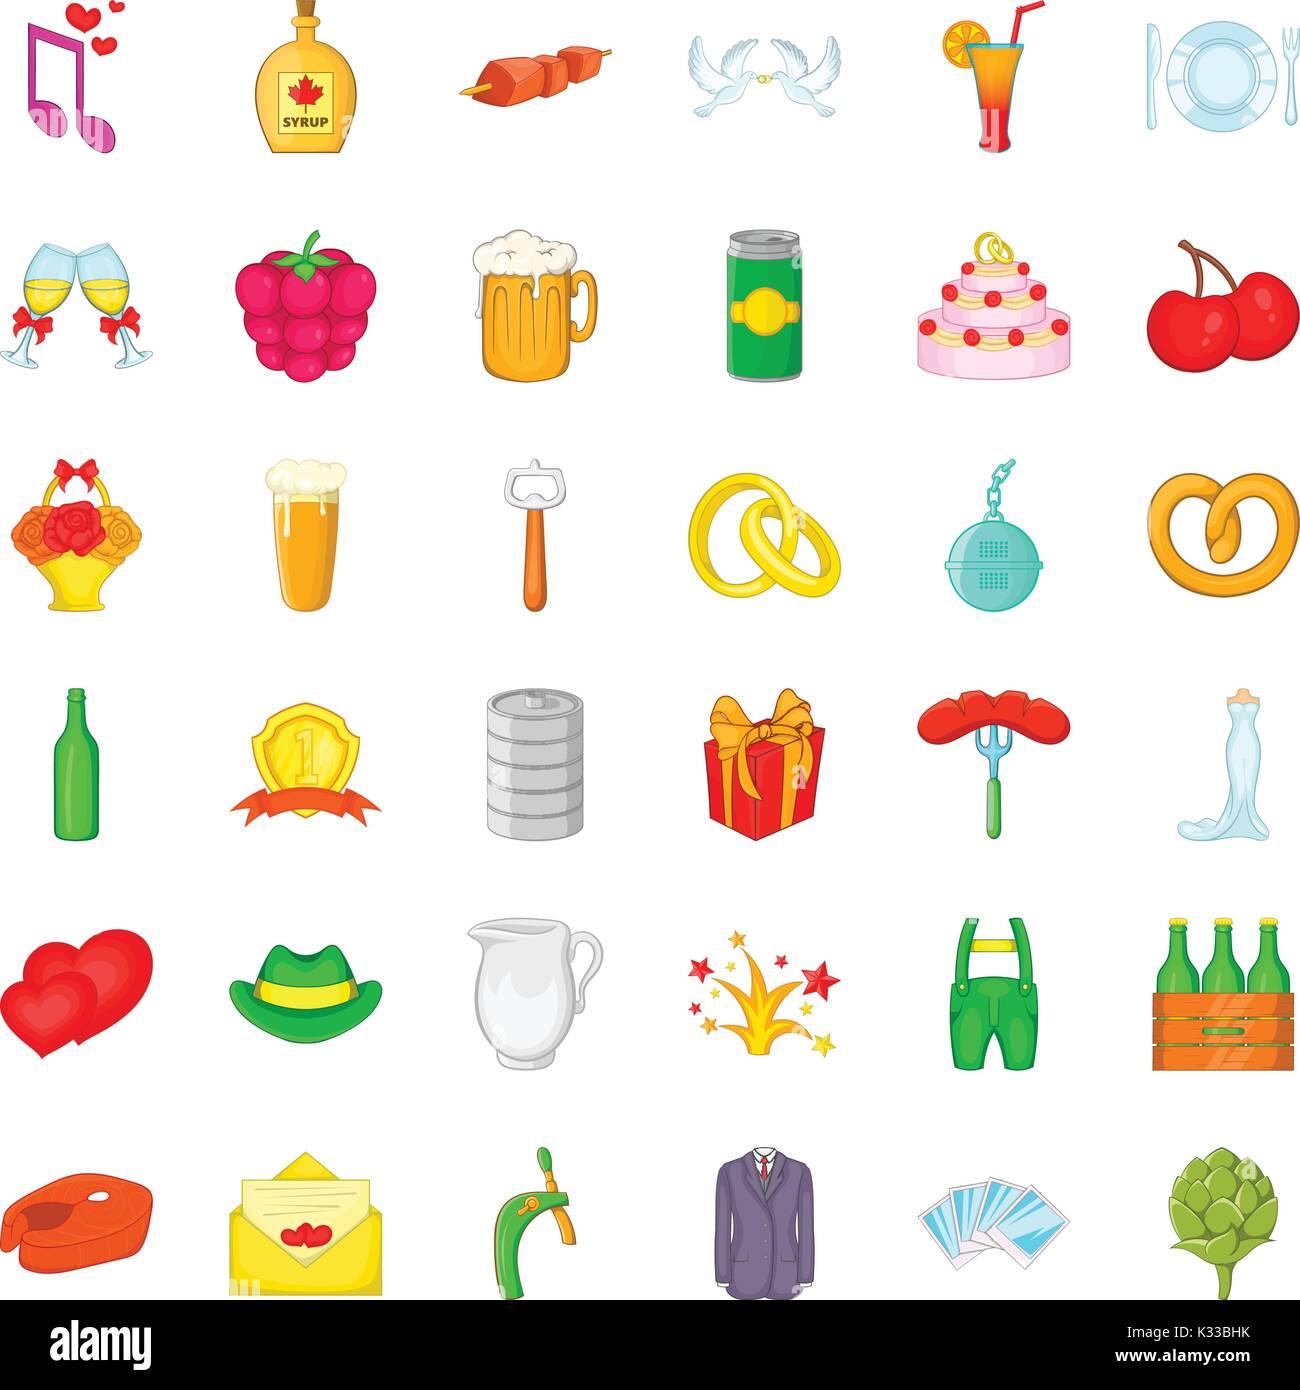 Wine icons set, cartoon style - Stock Vector